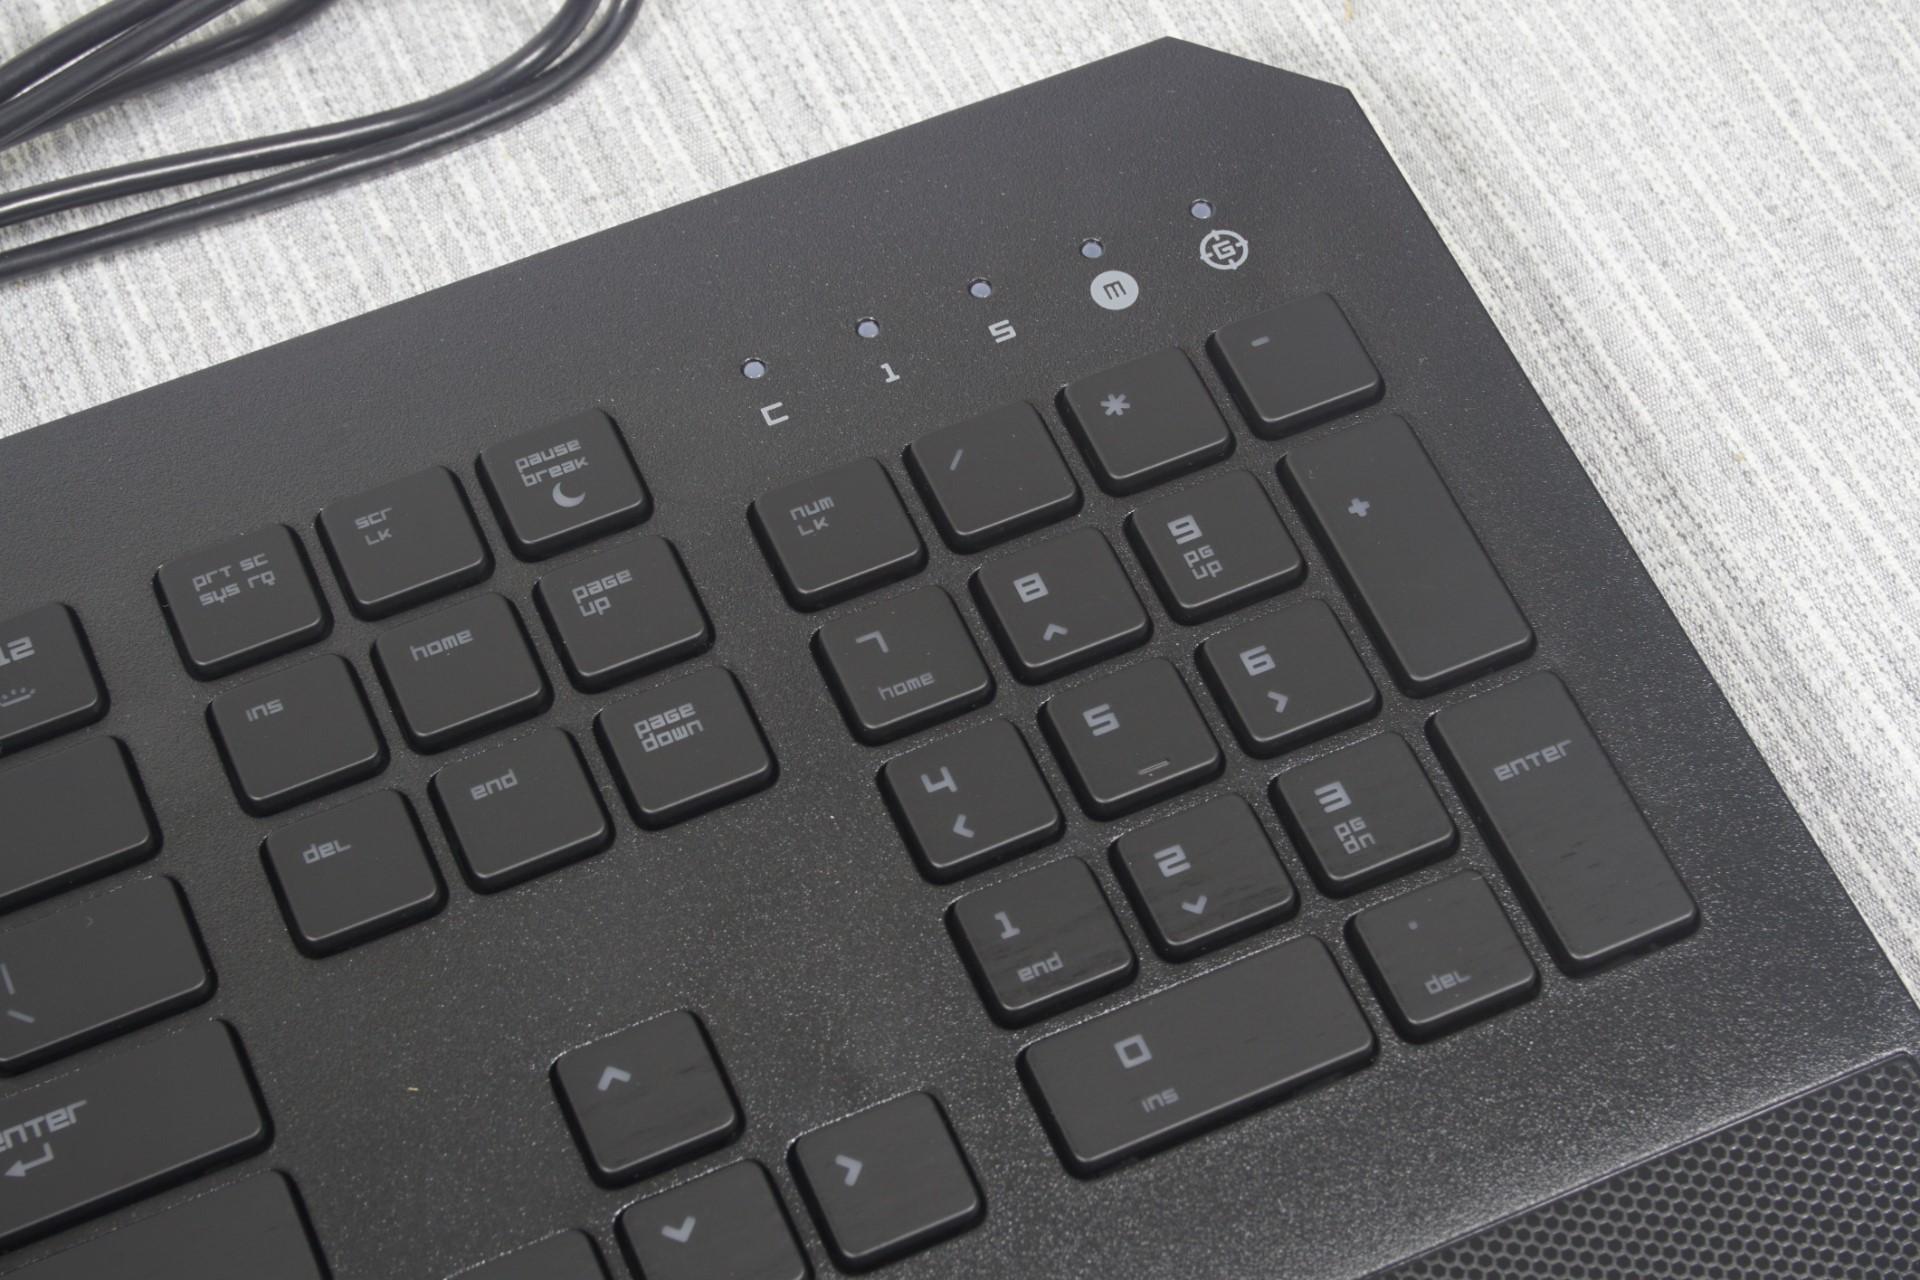 00ac3fd85c7 The DeathStalker Chroma Gaming Keyboard - The Razer DeathStalker ...